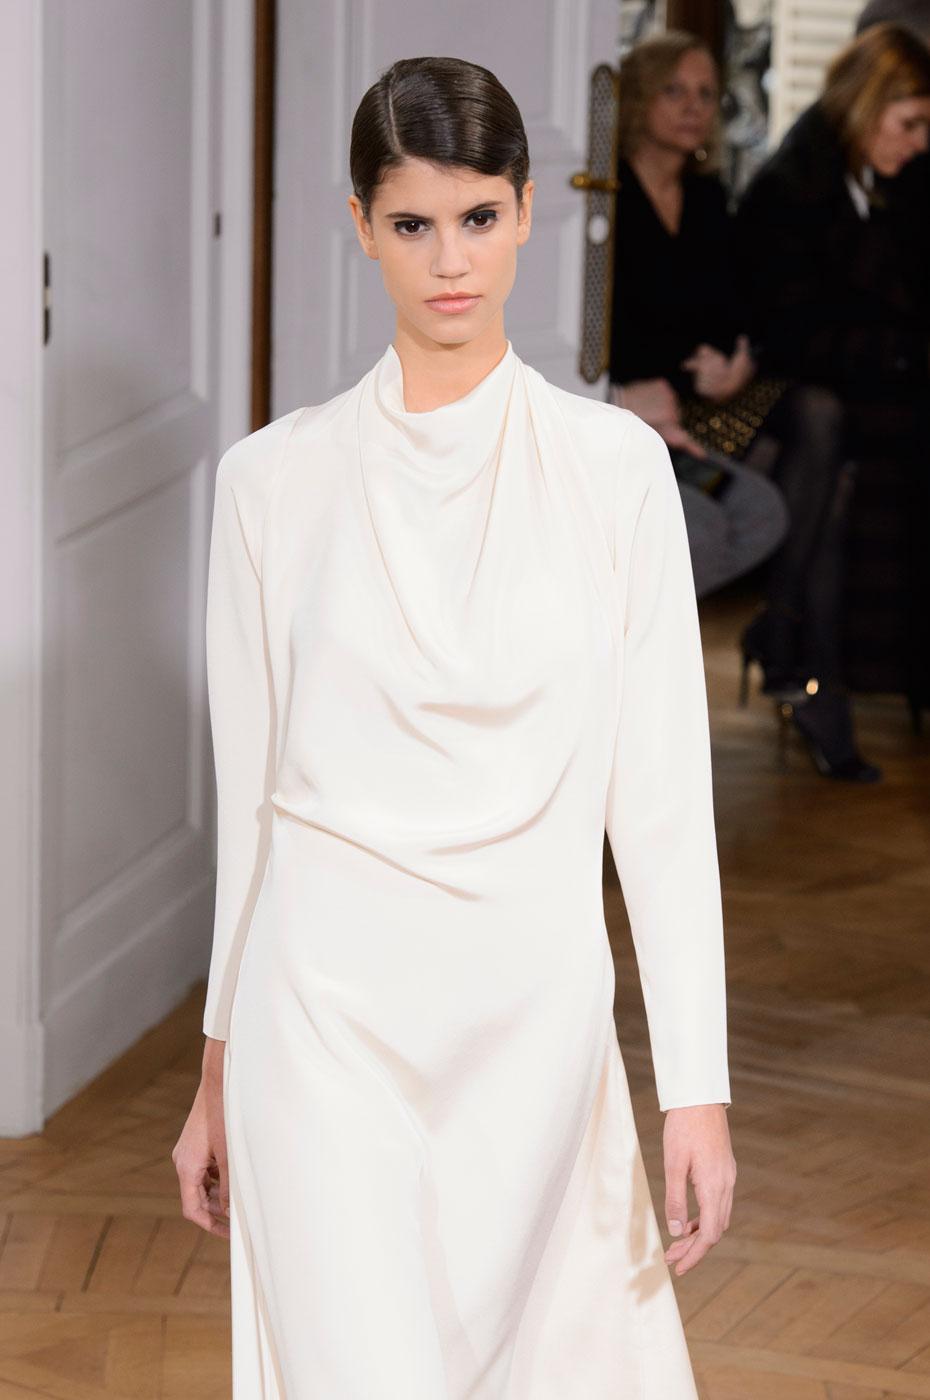 Bouchra-Jarrar-fashion-runway-show-haute-couture-paris-spring-summer-2015-the-impression-20